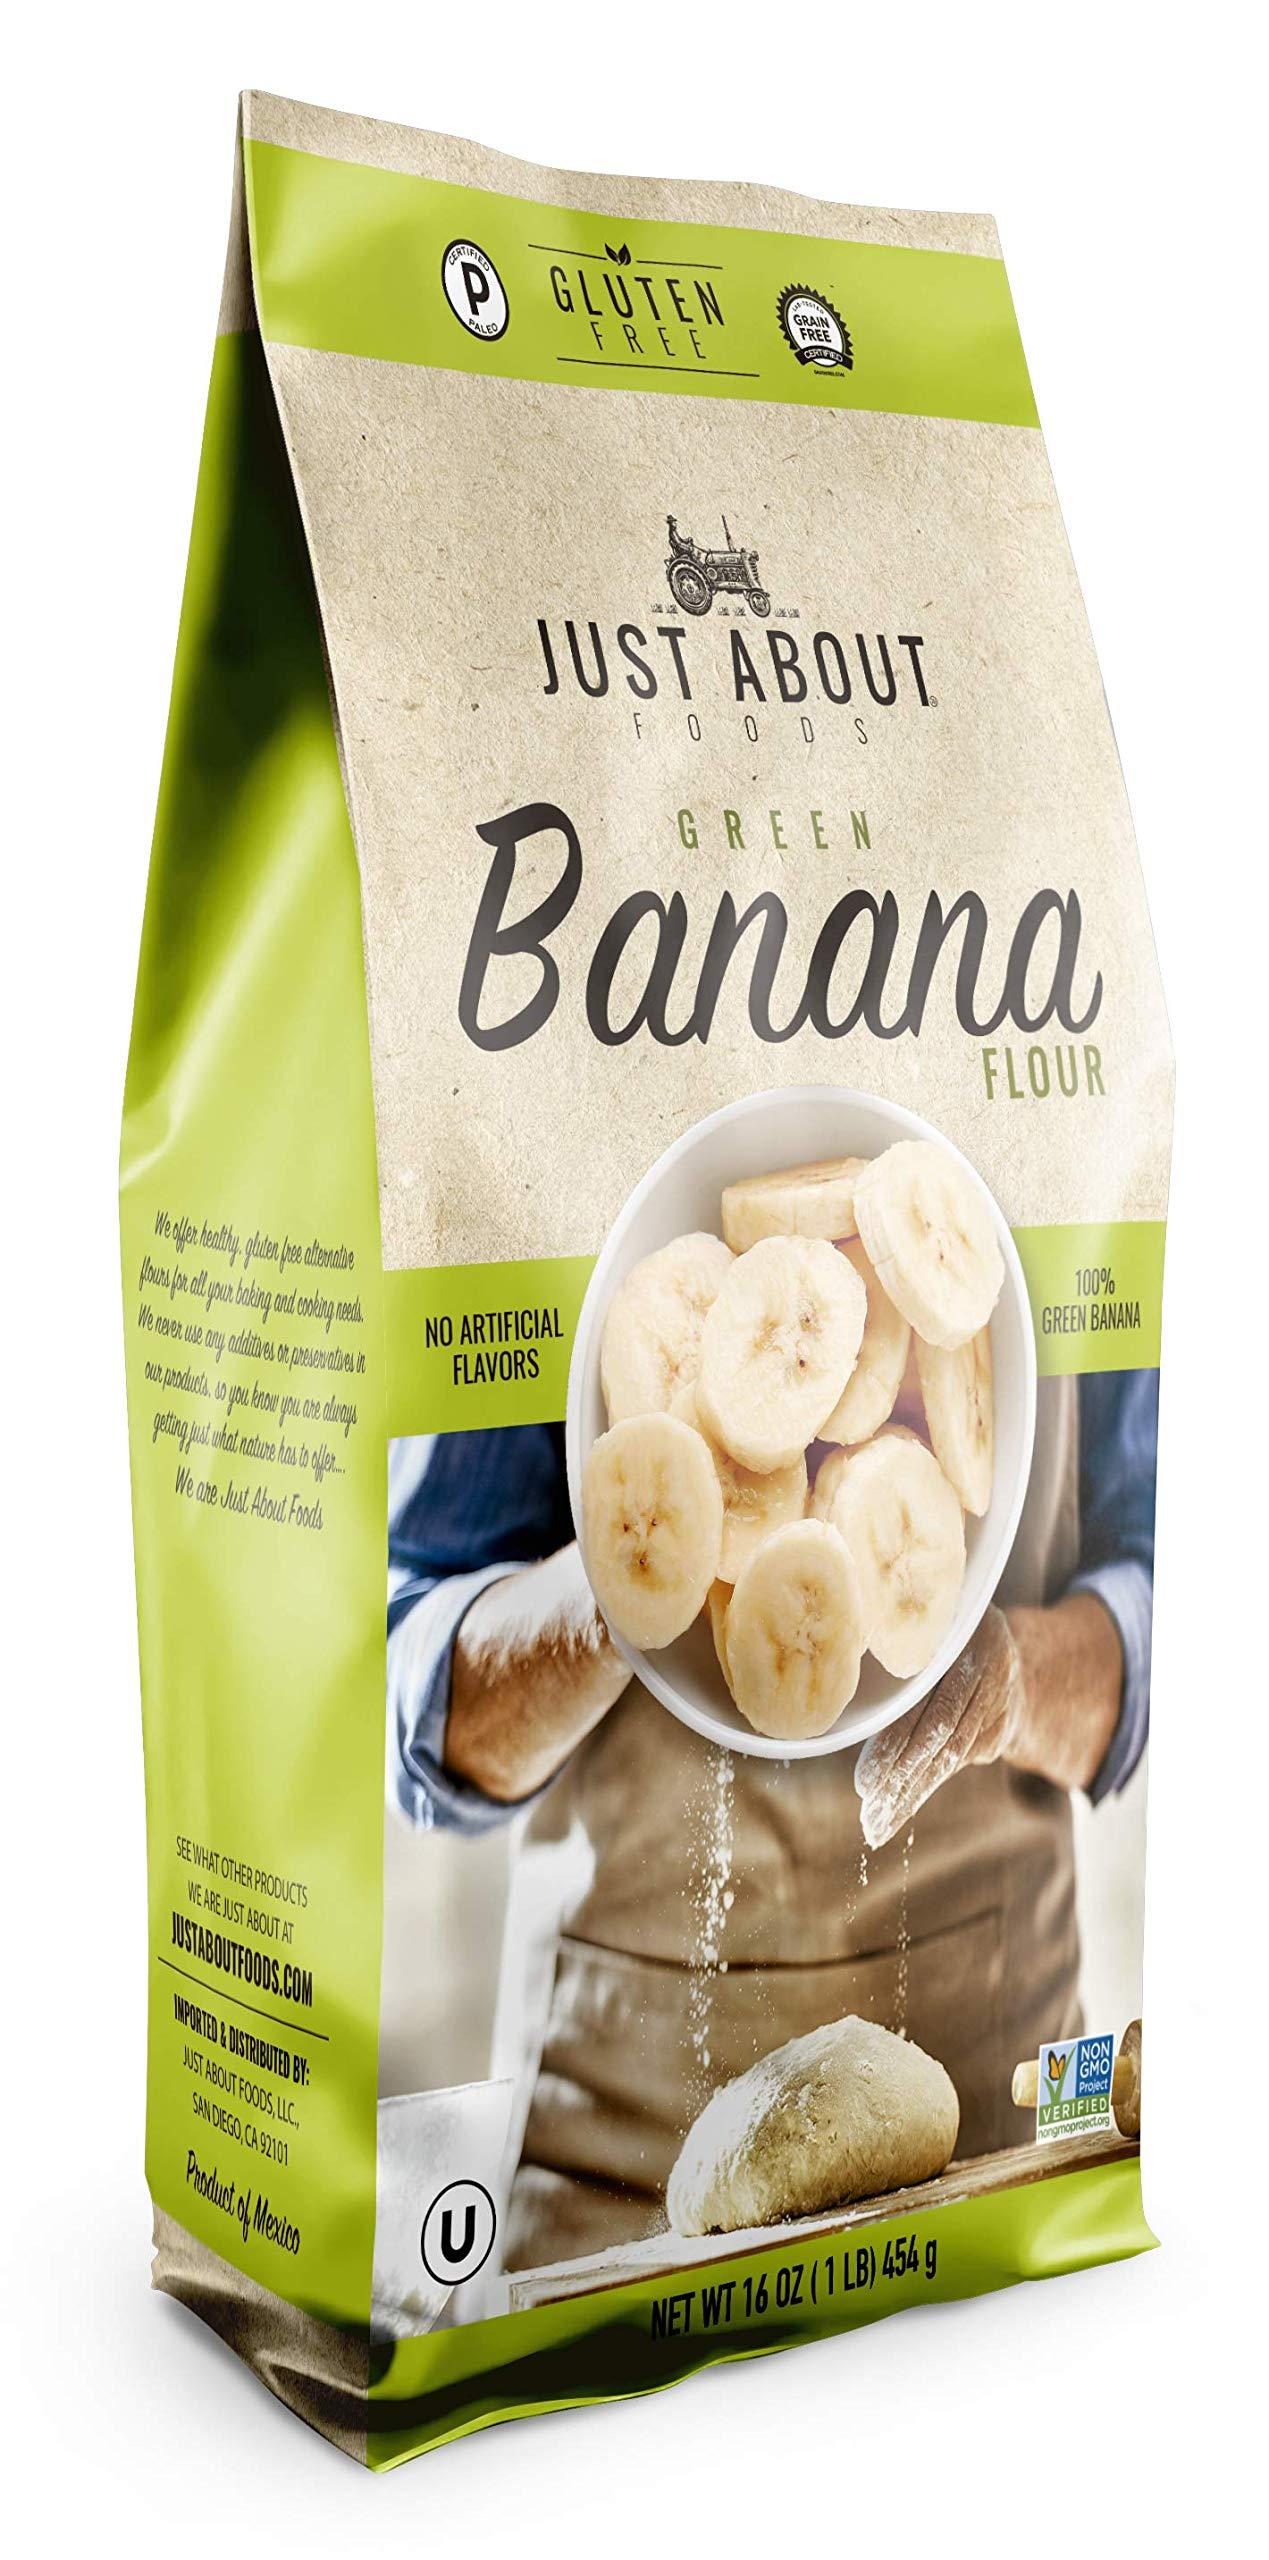 Just About Foods Banana Flour 1 Pound Paleo Grain Free Gluten Free Vegan Non GMO Pack of 1